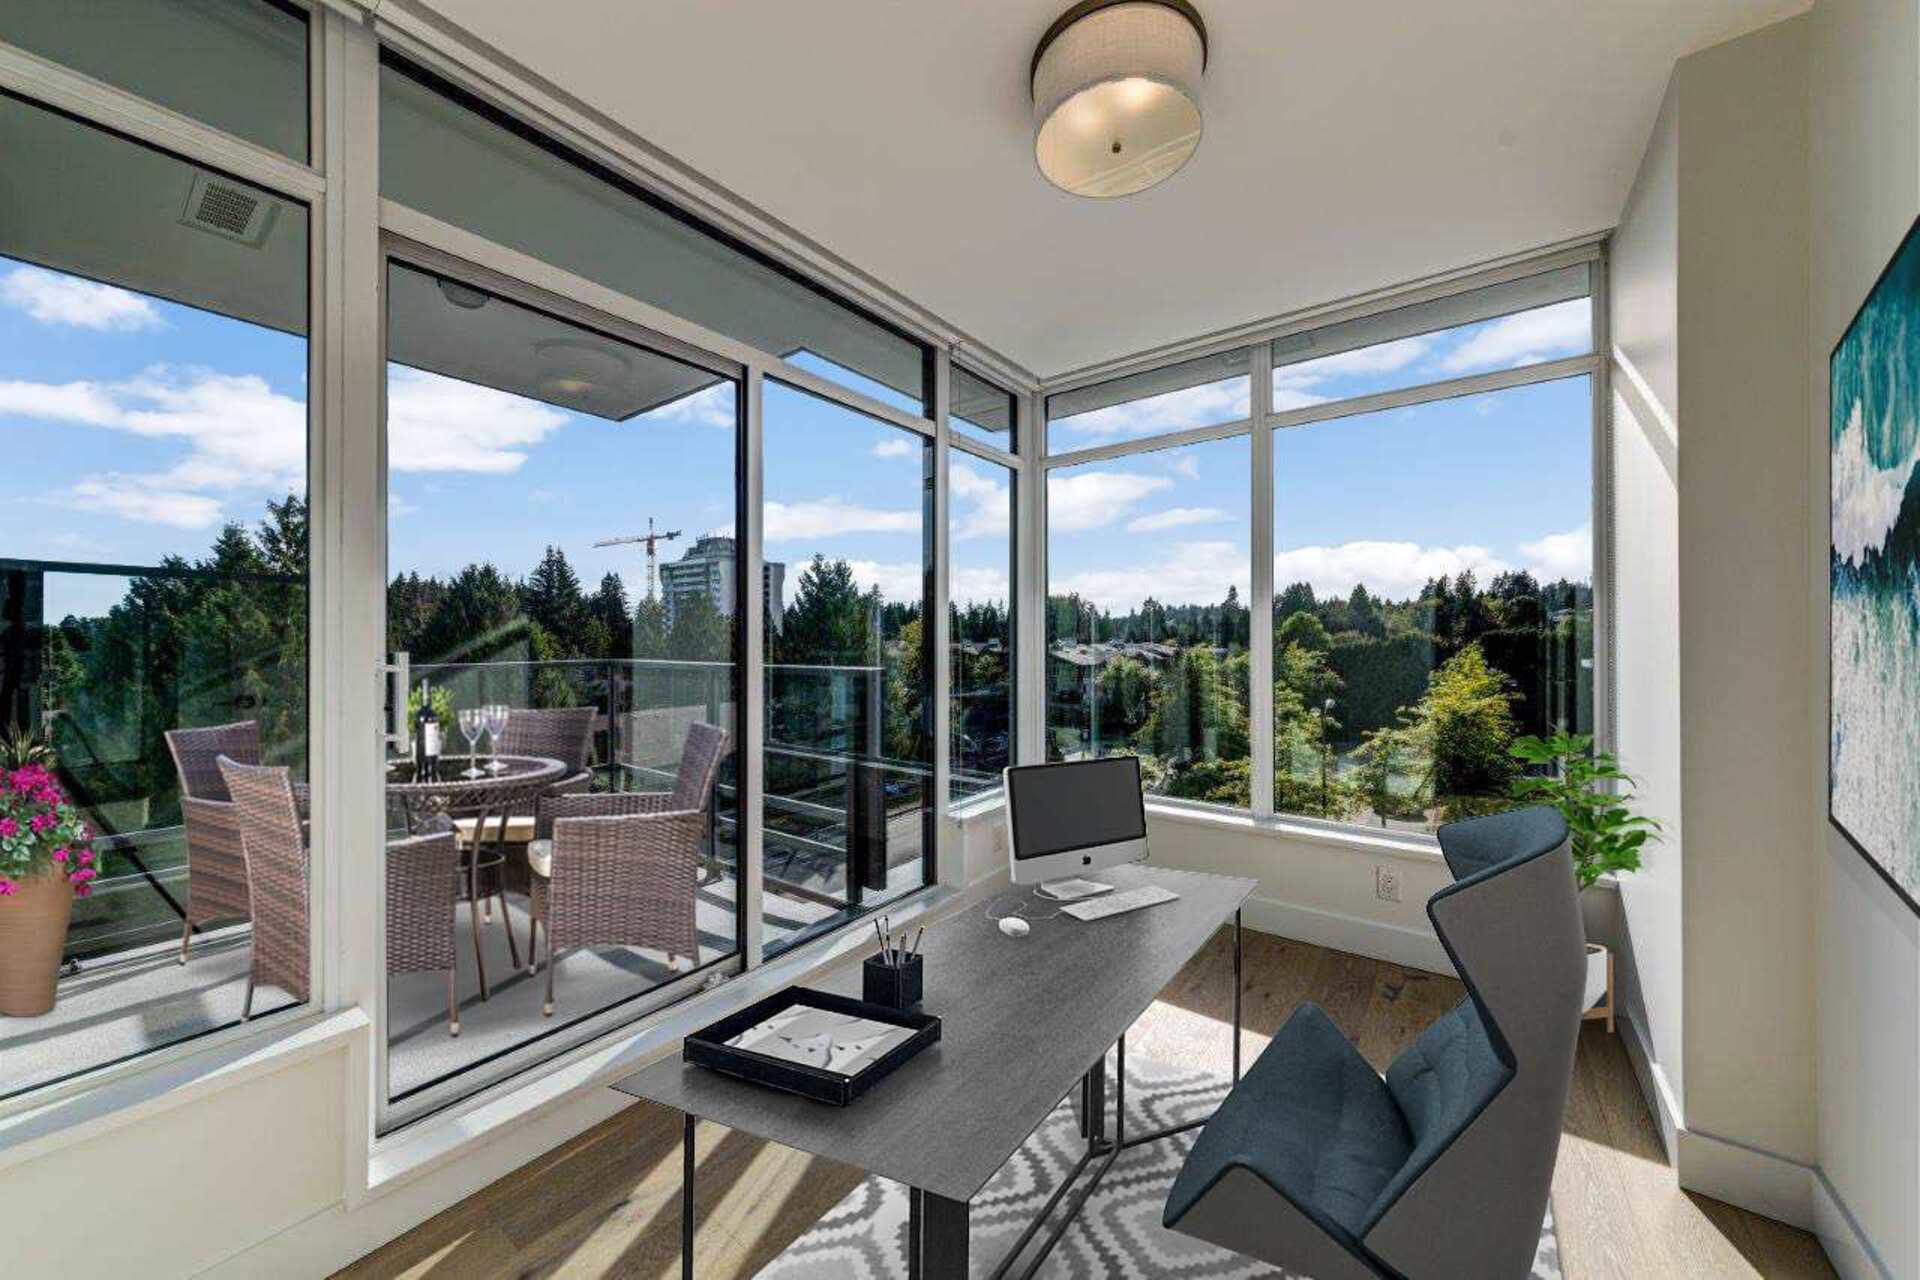 1210-e-27th-street-lynn-valley-north-vancouver-05 at 405 - 1210 E 27th Street, Lynn Valley, North Vancouver